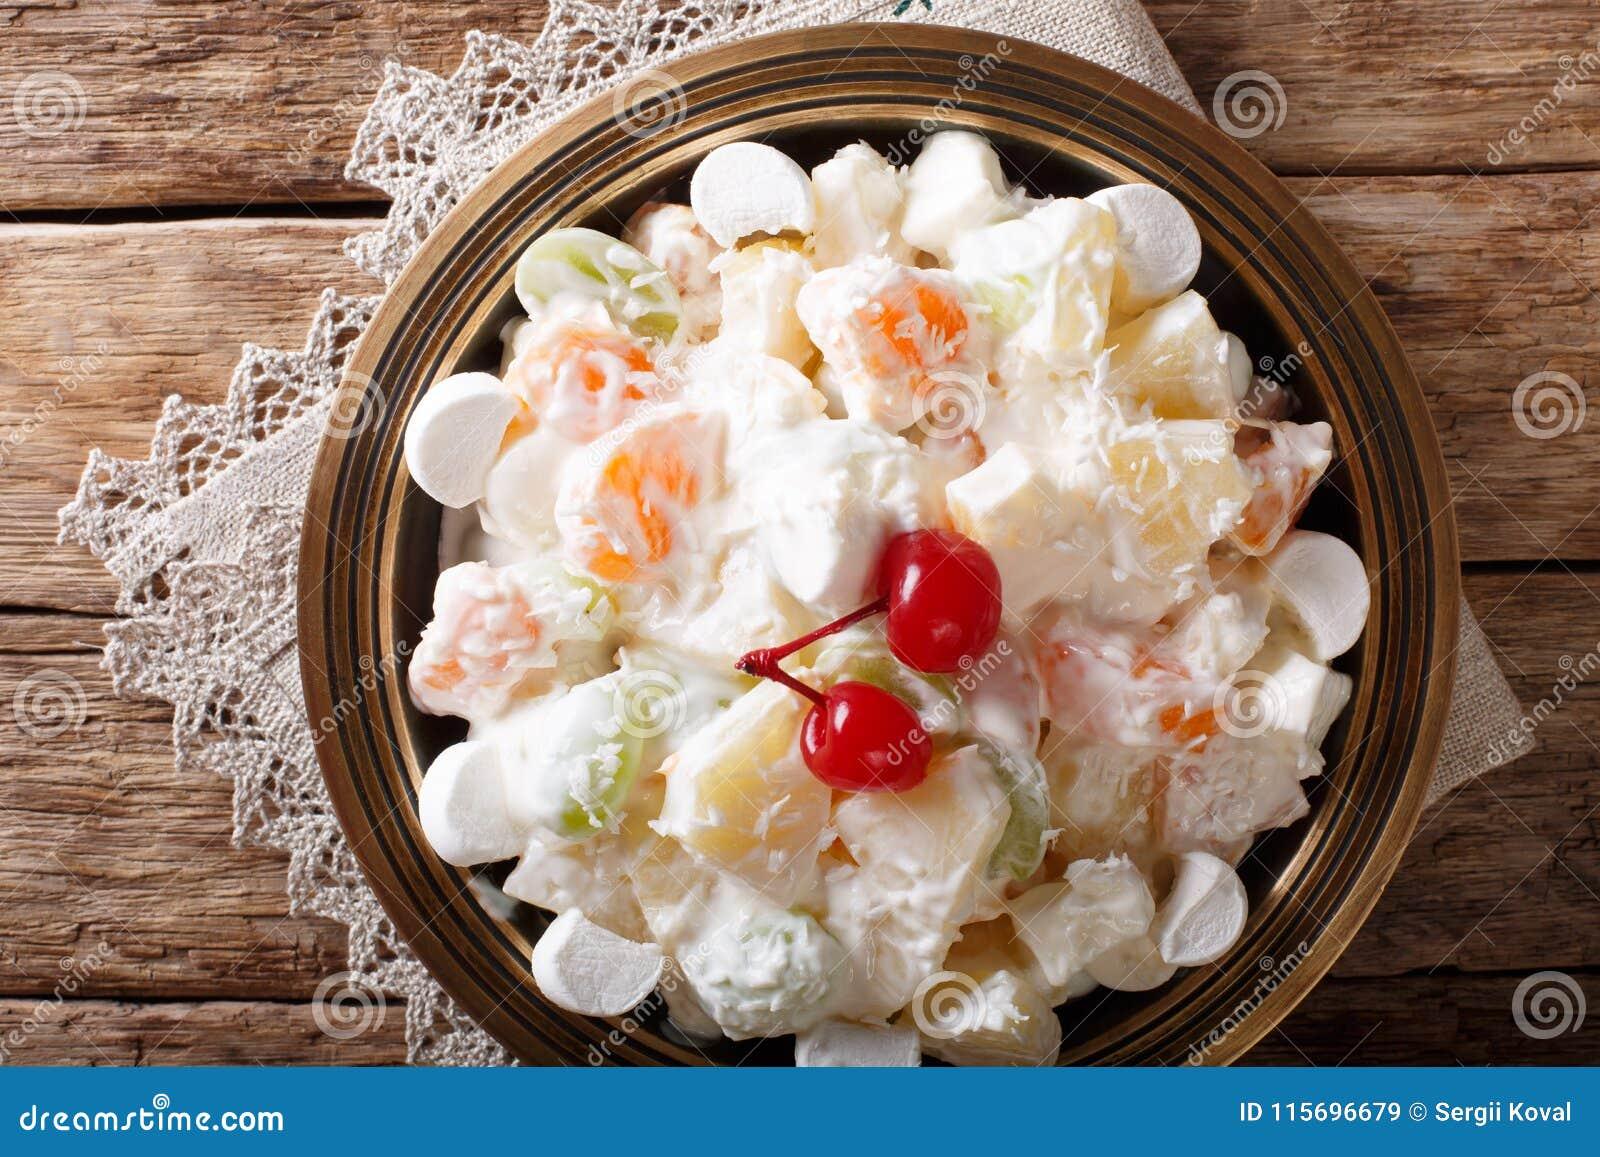 Light Fruit Salad Ambrosia With Marshmallow And Vanilla Yogurt C Stock Image Image Of Food Horizontal 115696679